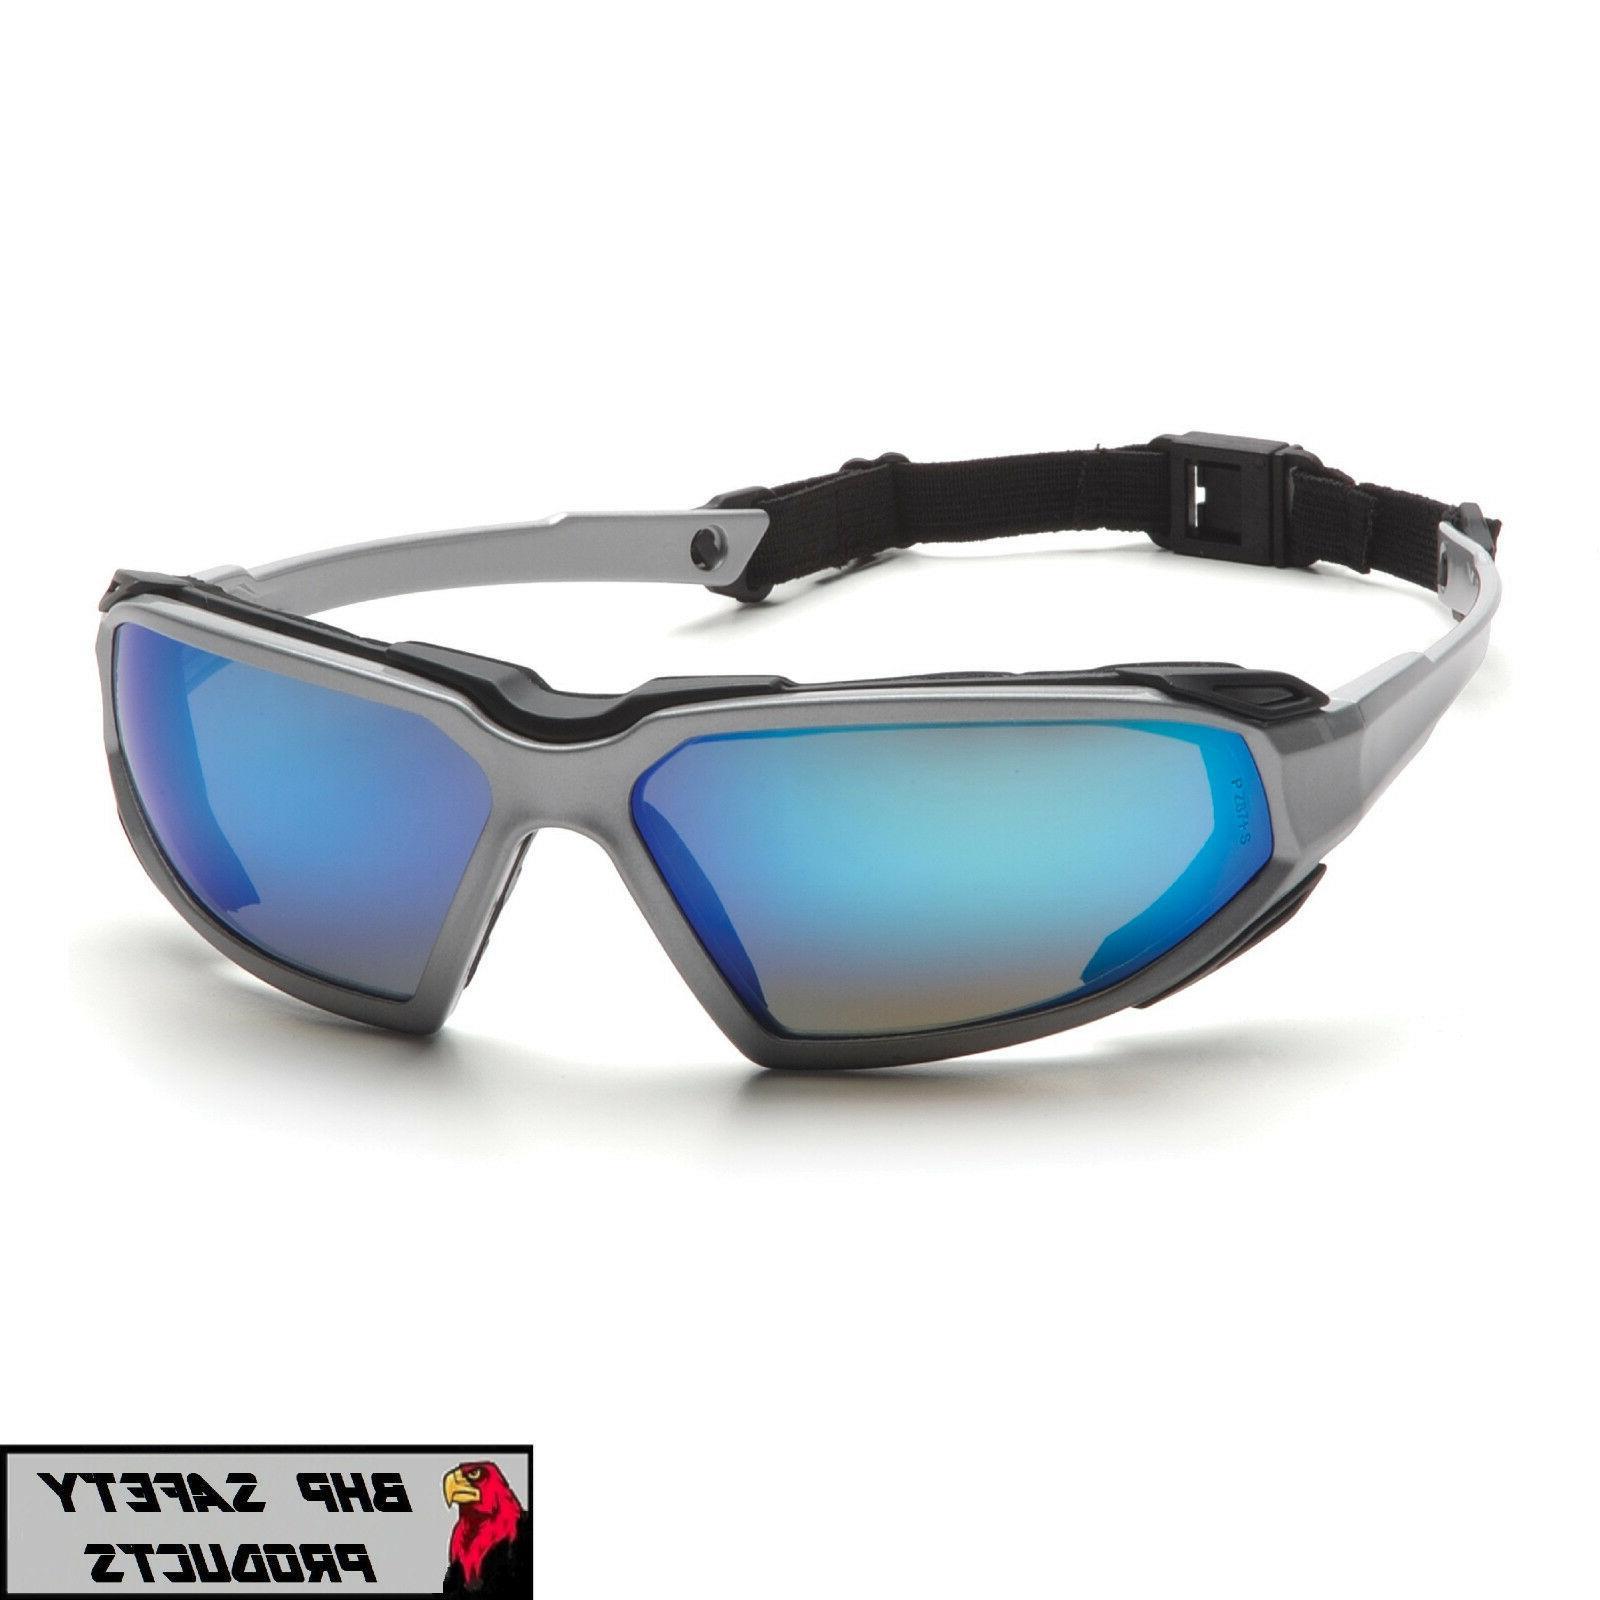 highlander safety glasses sky blue mirror anti